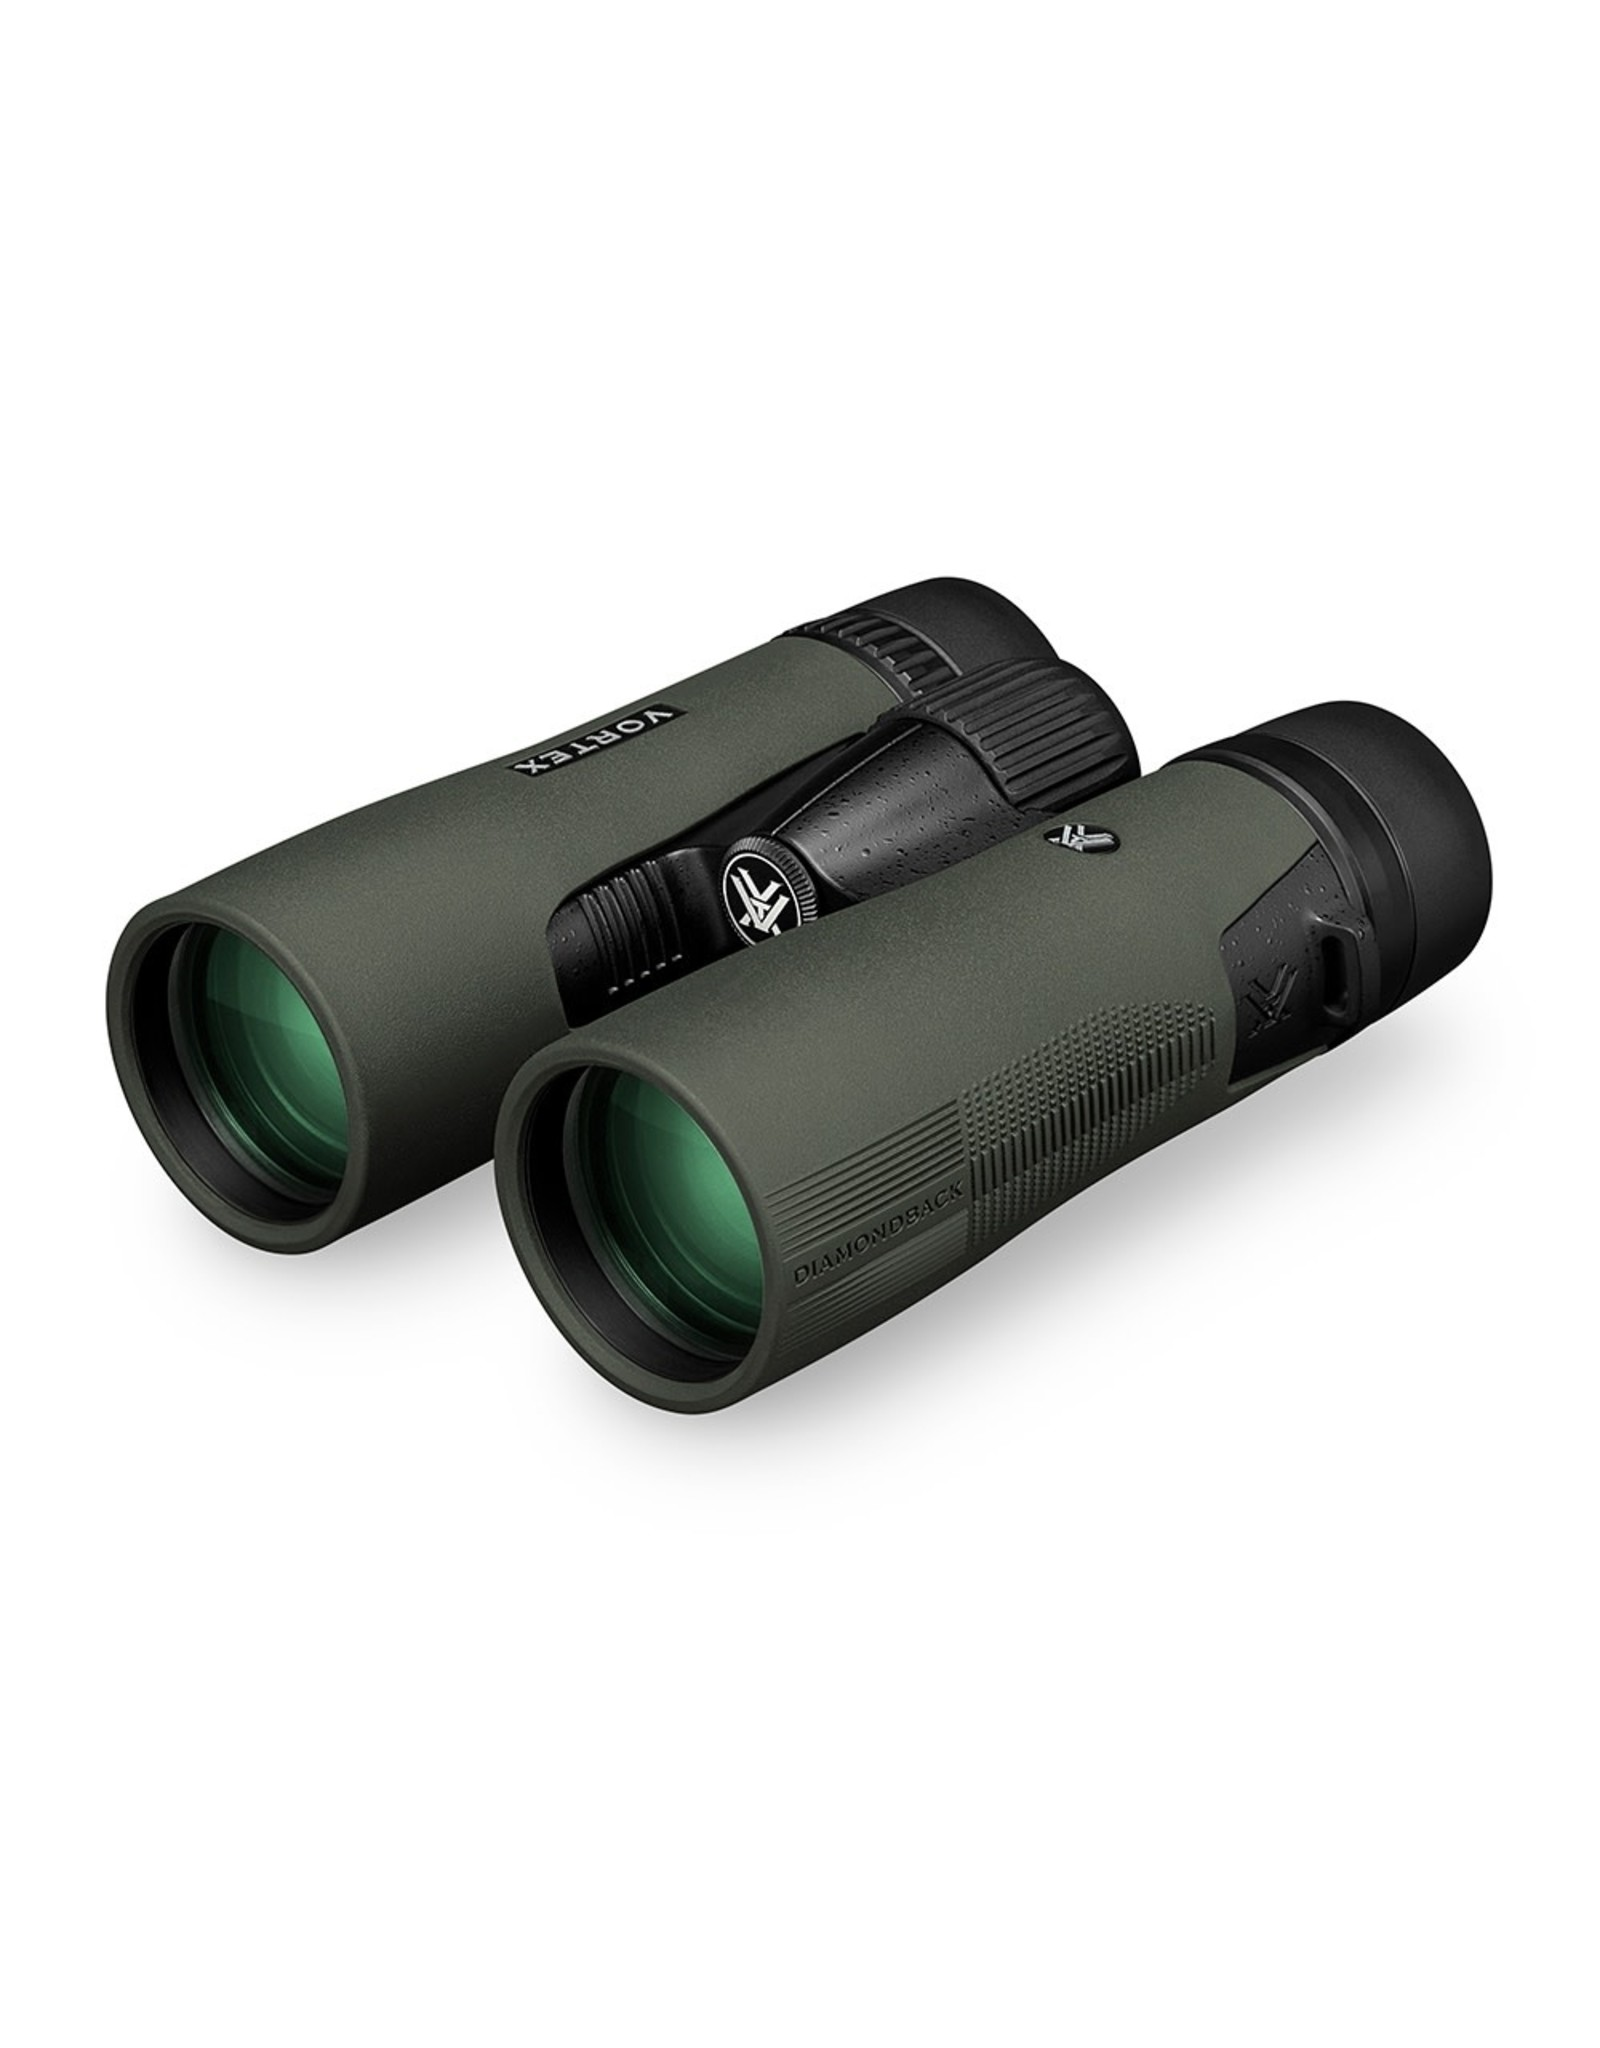 Vortex Optics VT-DB21 4 VORTEX Diamondback 8x42 Binoculars